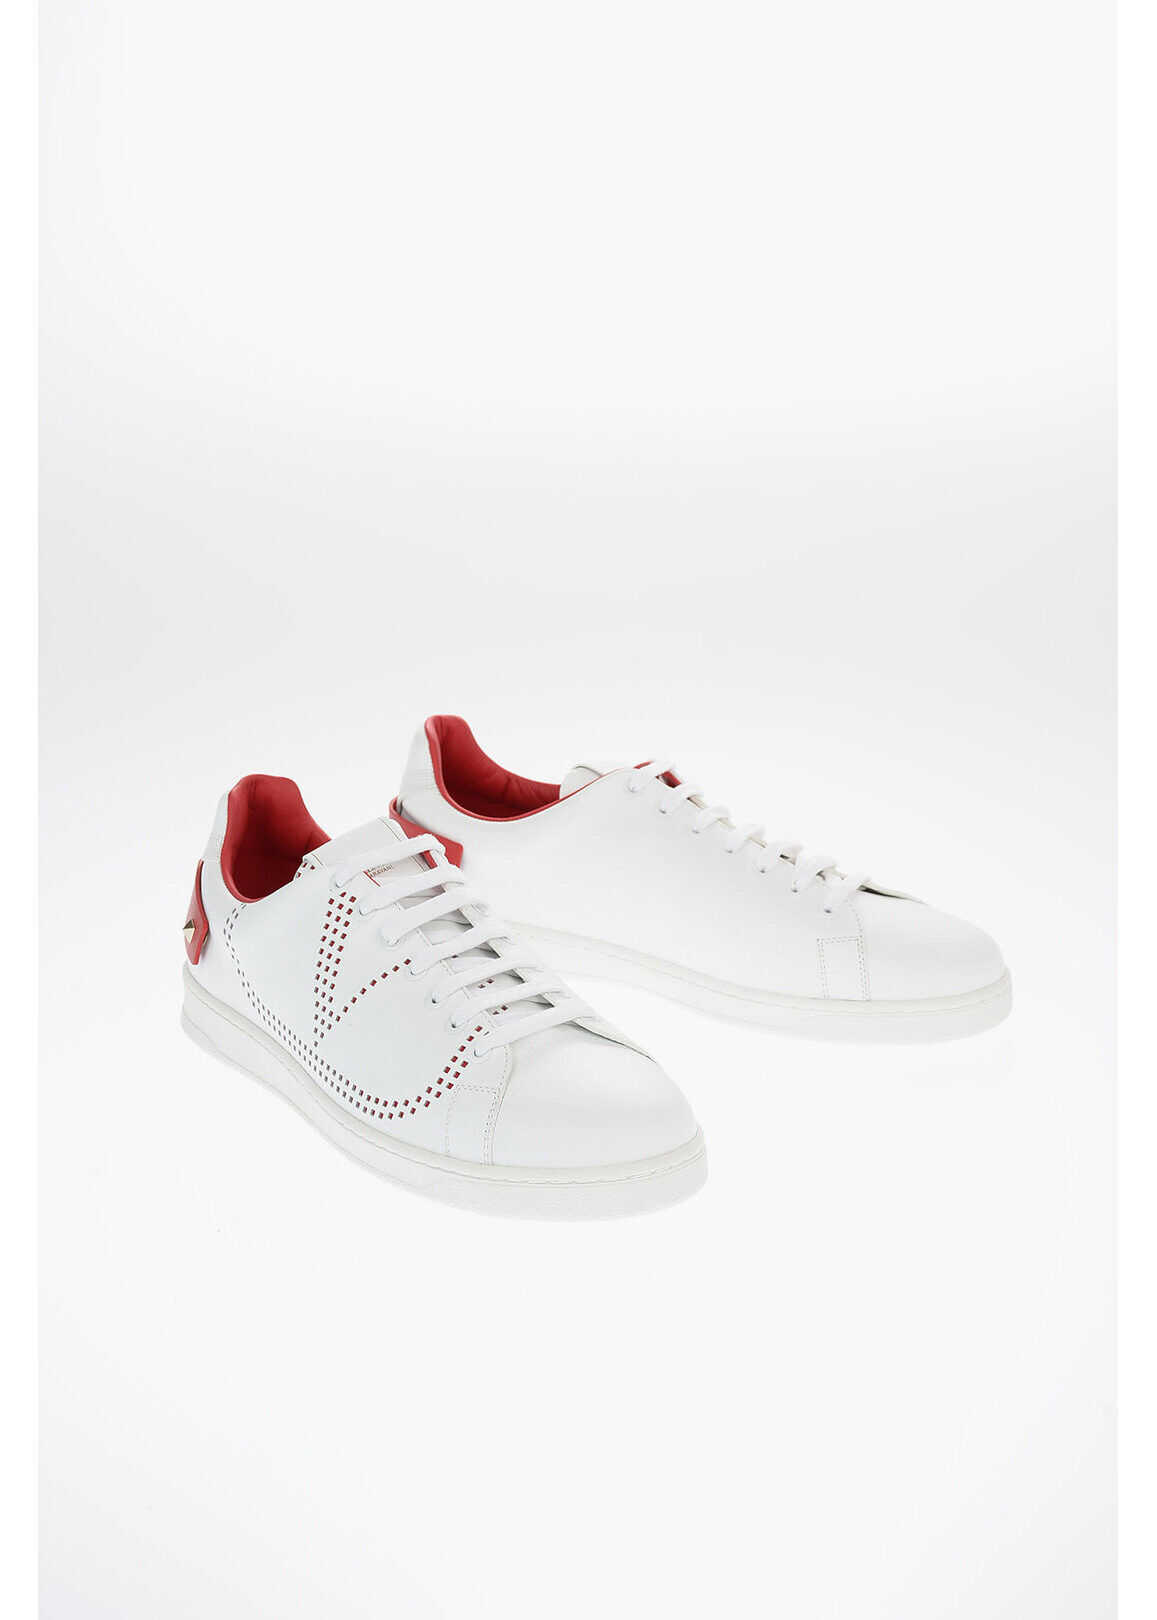 Valentino Garavani GARAVANI Leather BACKNET VLOGO Sneakers WHITE imagine b-mall.ro